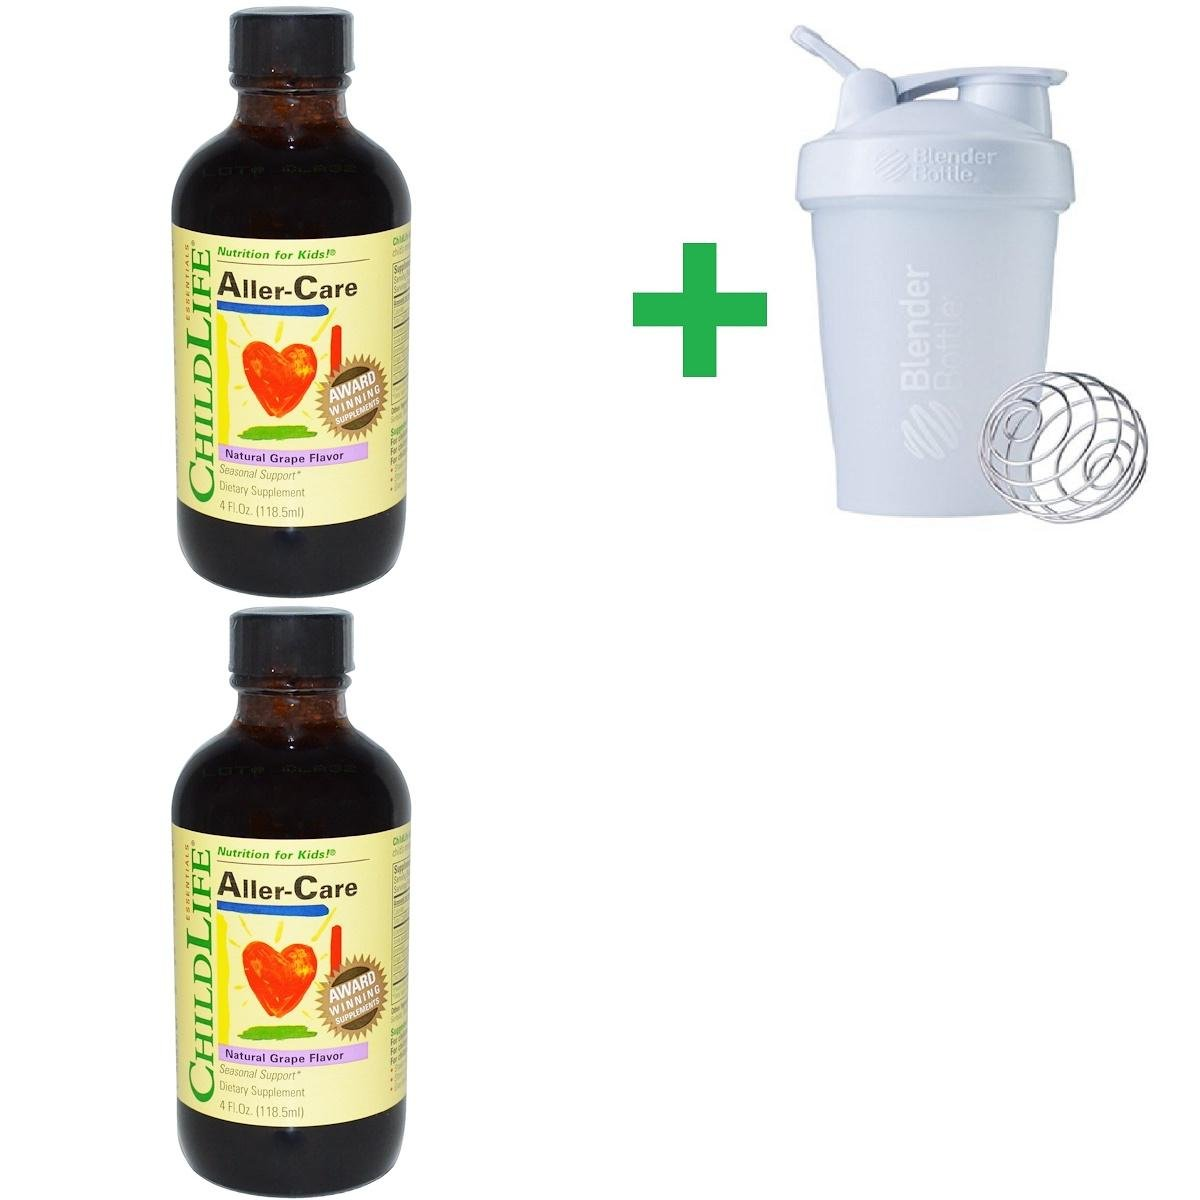 ChildLife, Essentials, Aller-Care, Natural Grape Flavor, 4 fl oz (118.5 ml) (2 PACKS) + Assorted Sundesa, BlenderBottle, Classic With Loop, 20 oz